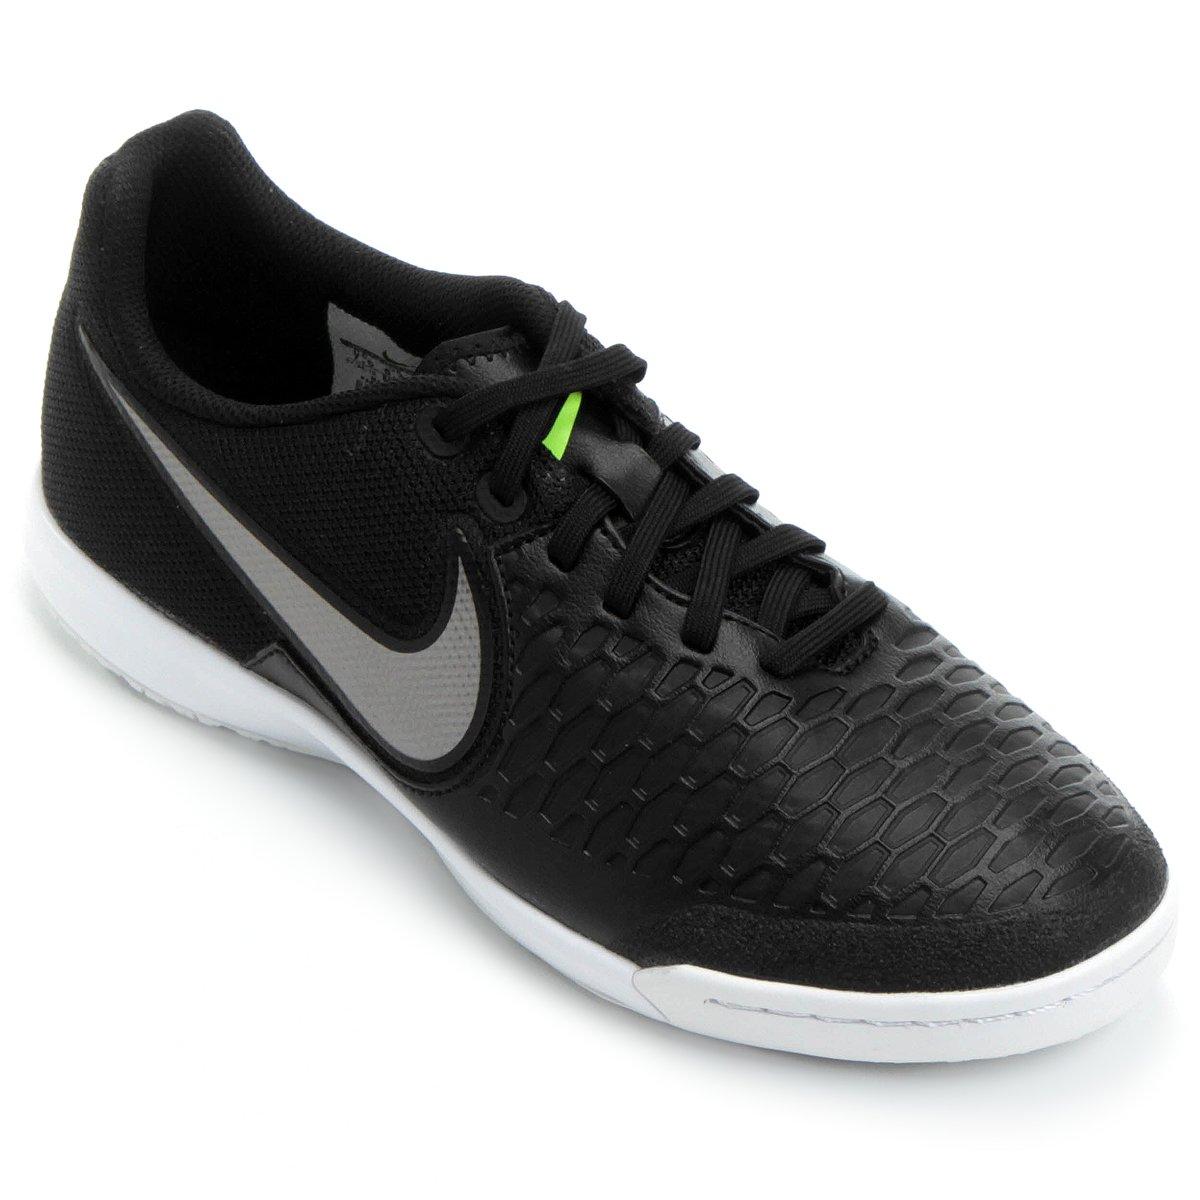 a32452b317 Chuteira Nike Magista X Pro IC Futsal - Compre Agora